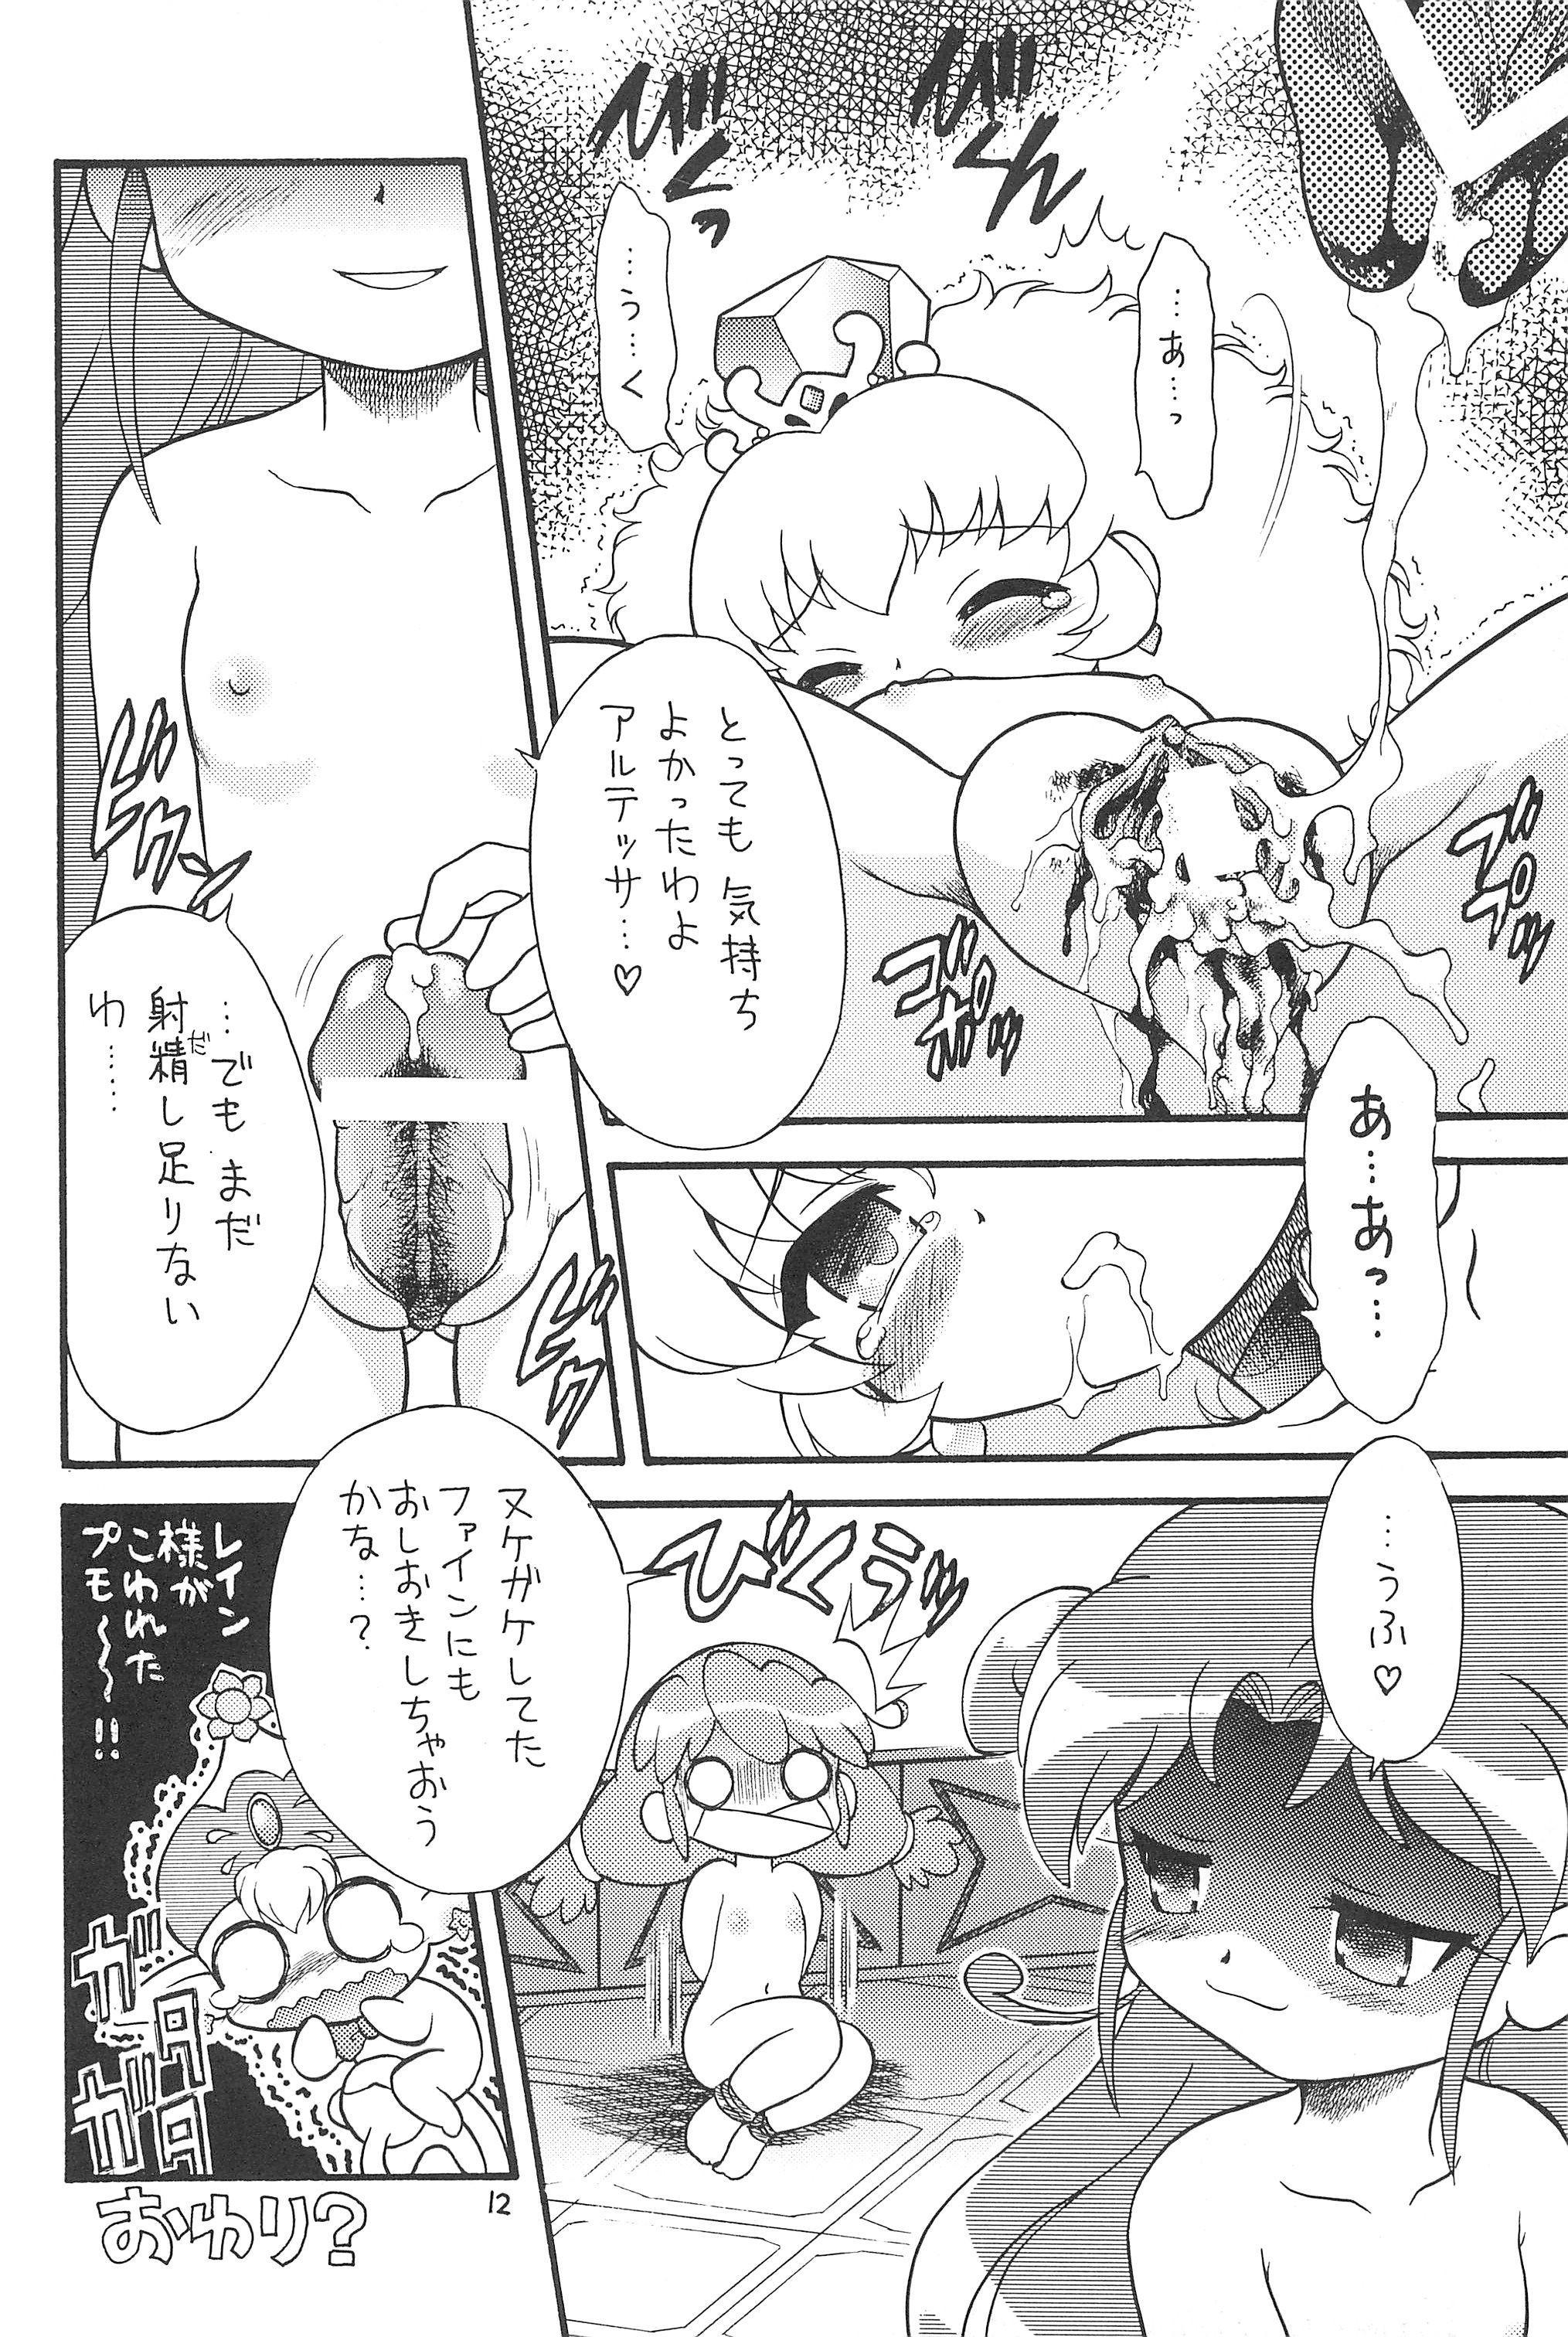 Higawari Obentou 11